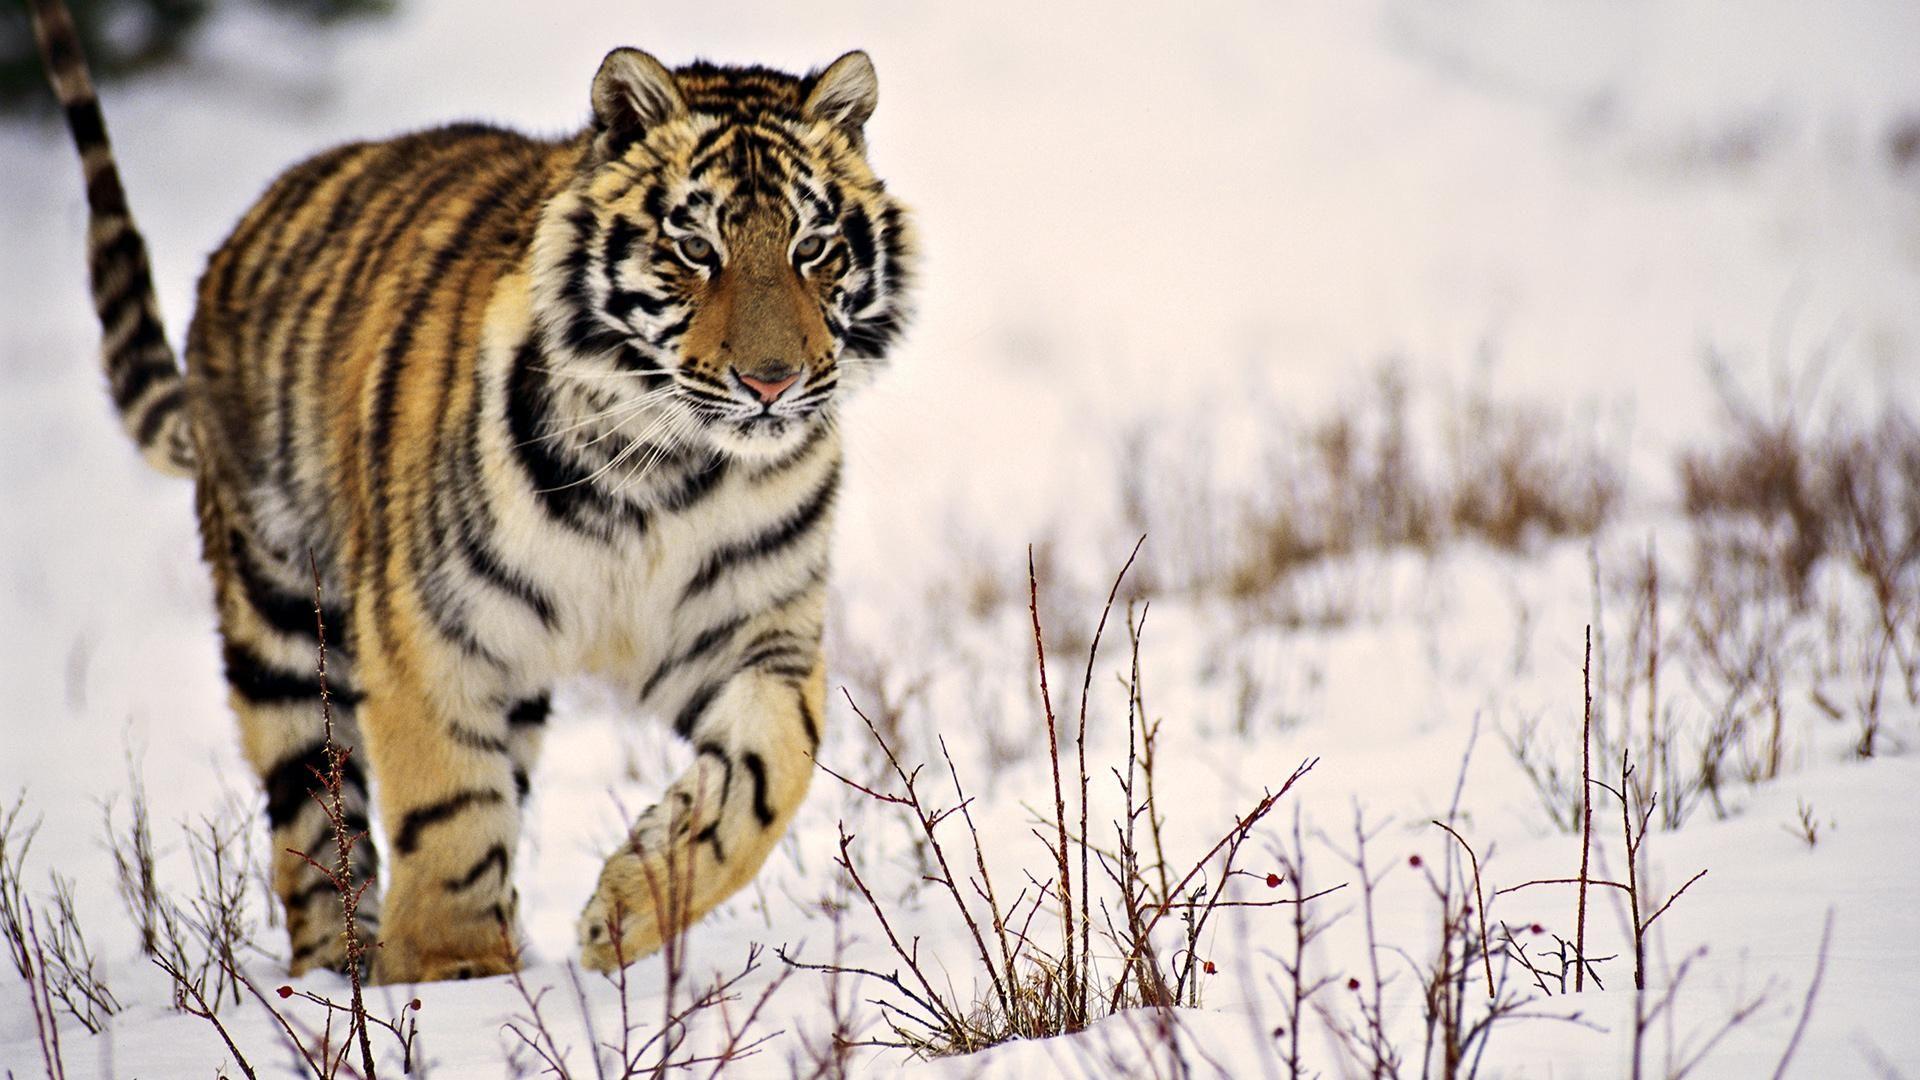 Wallpapers Tiger Wallpaper